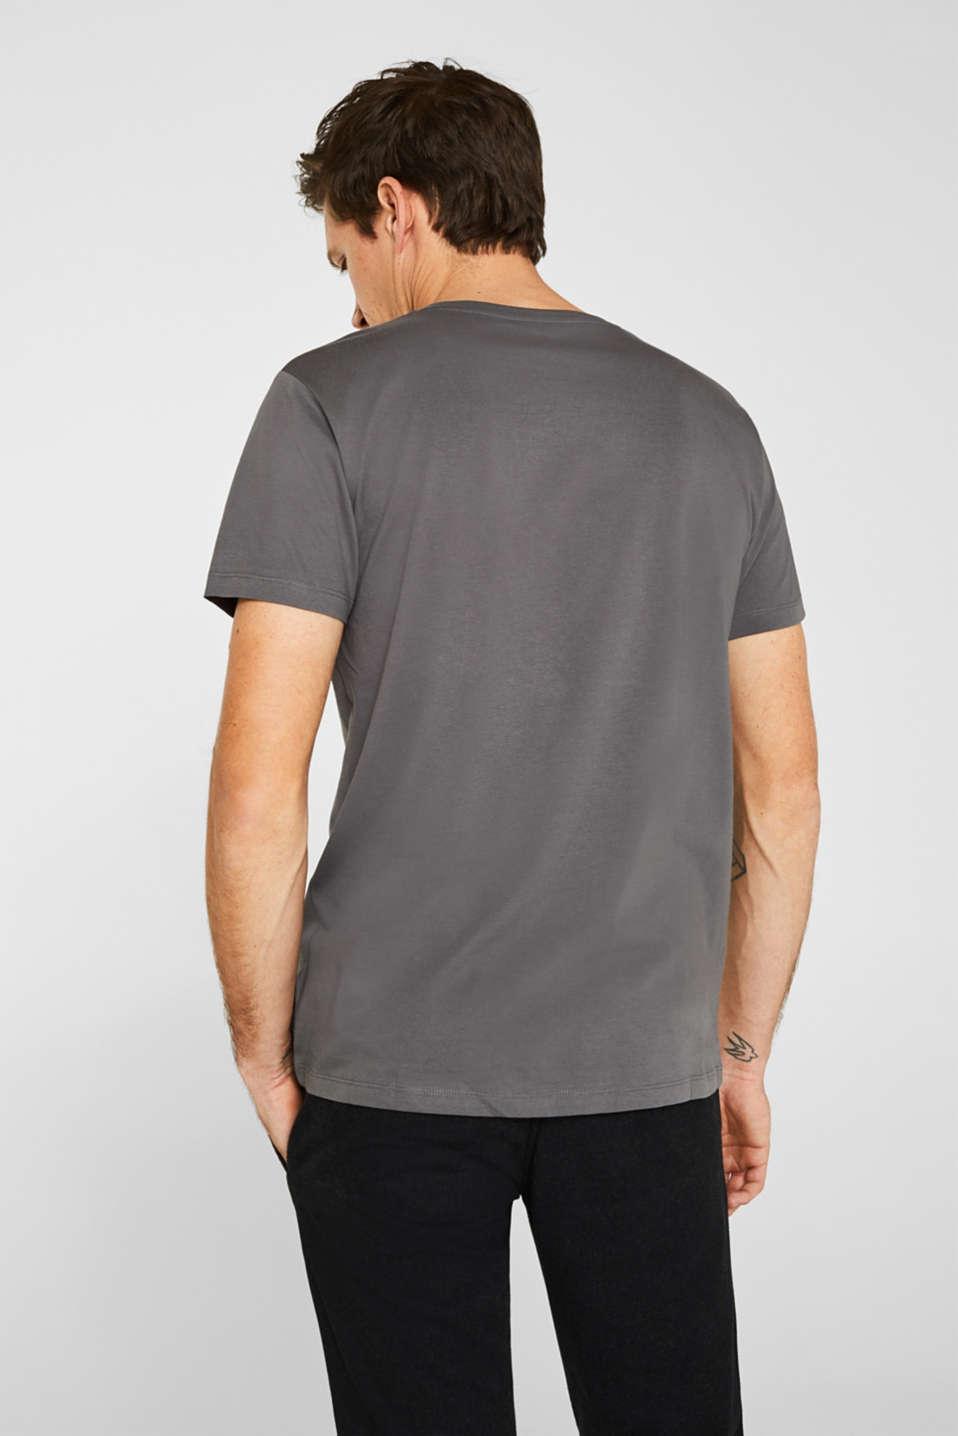 Jersey T-shirt in 100% cotton, DARK GREY, detail image number 3